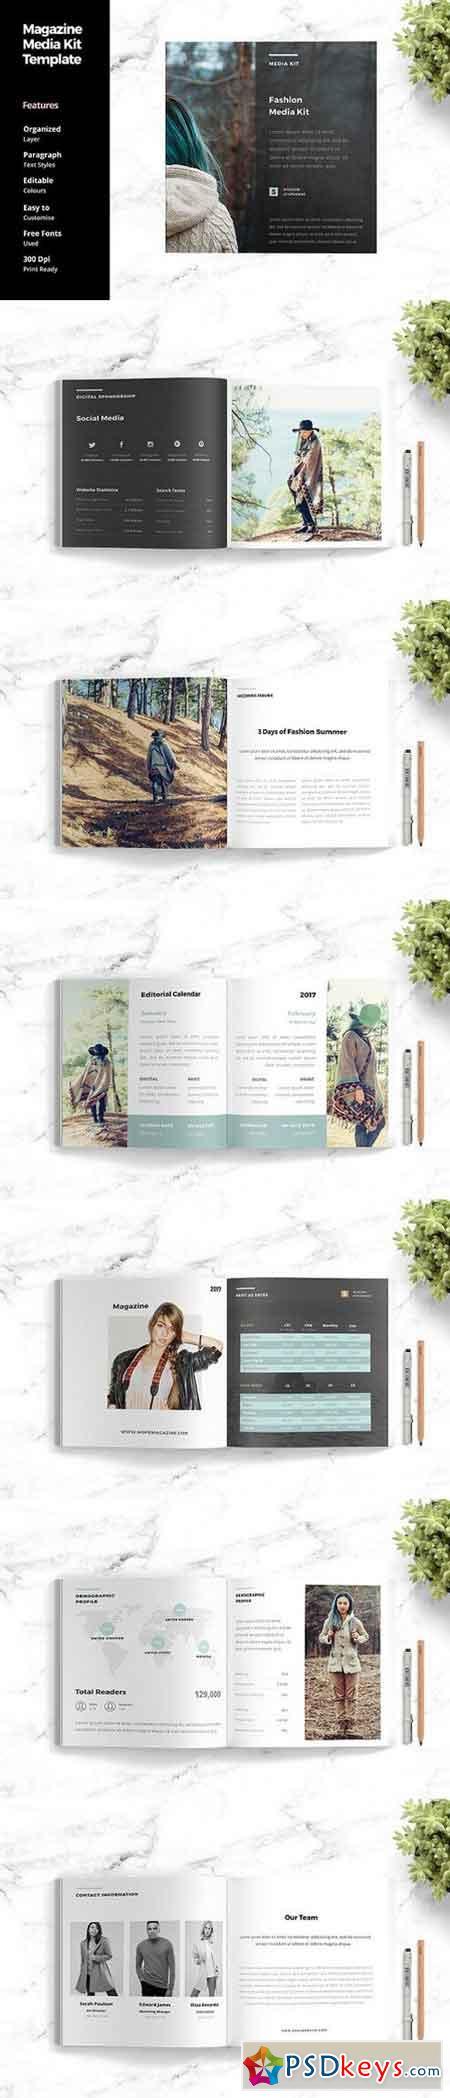 online media kit template - magazine media kit template 1409402 free download